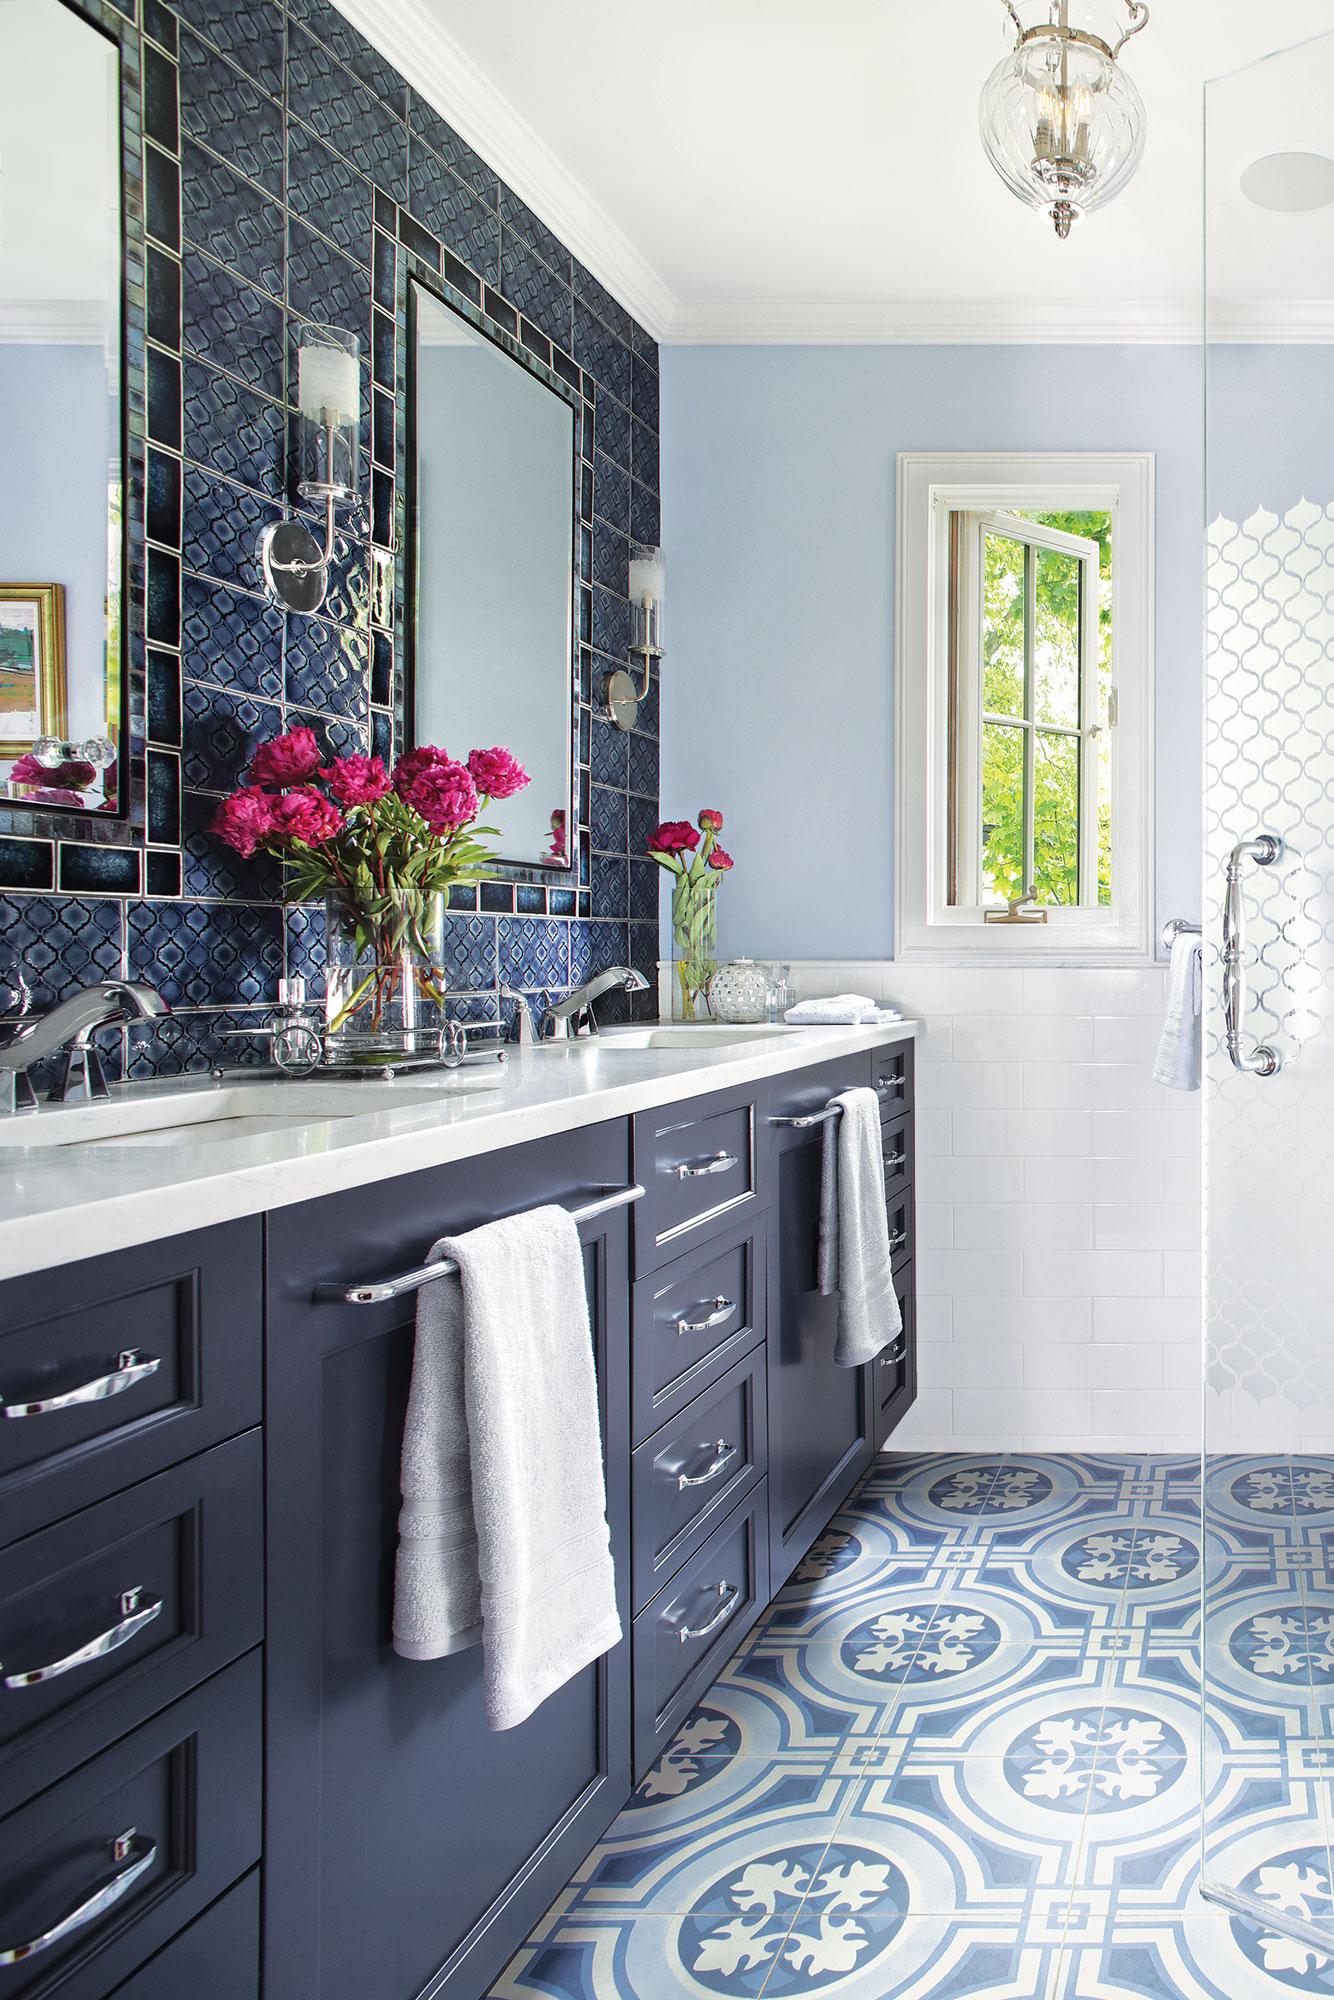 ridgewood bathroom expansion offers